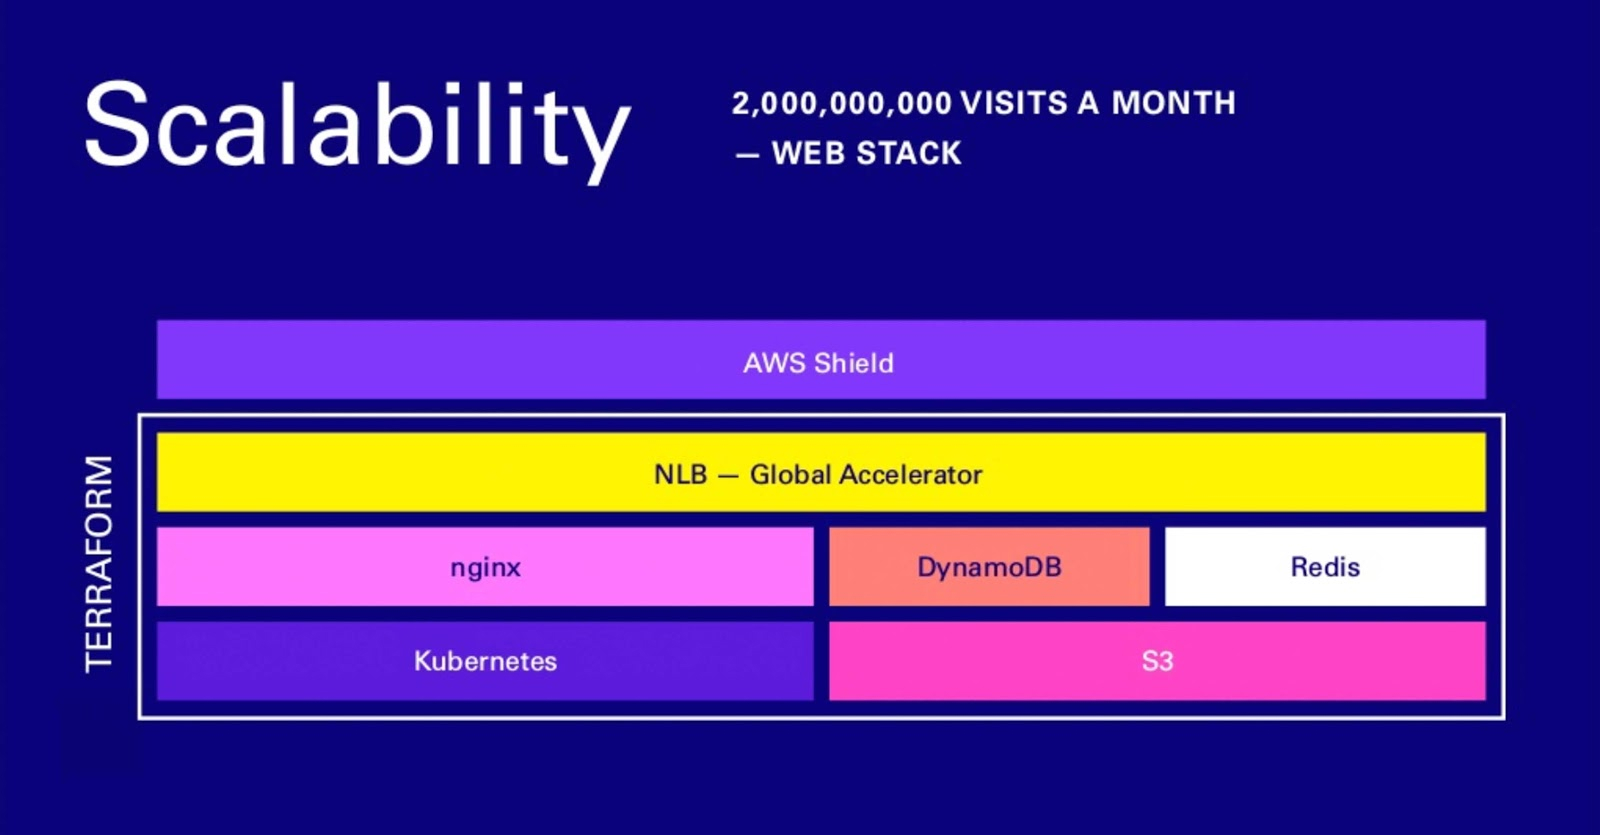 webflow scalability stack, over 2 billion visits a month. AWS shield, NLB - global accelerator, nginx, kubernetes, dynamoDB, redis, S3